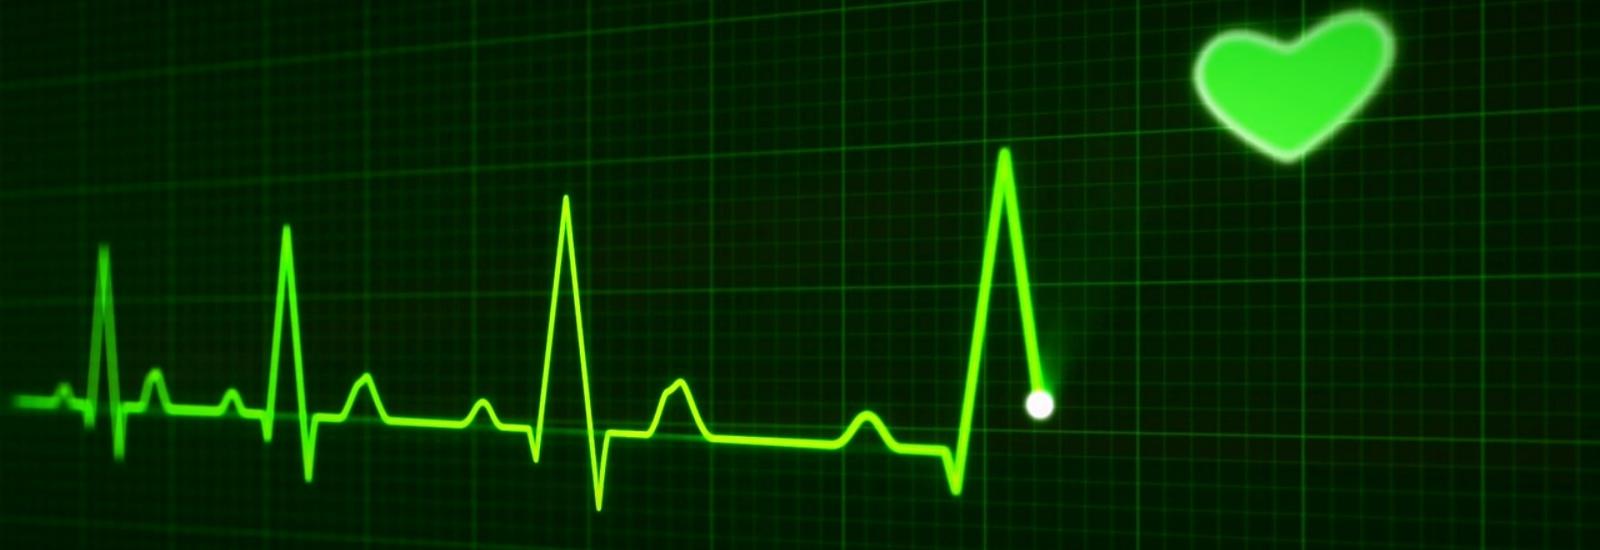 heartbeat-163709_1280-546582-edited.jpg